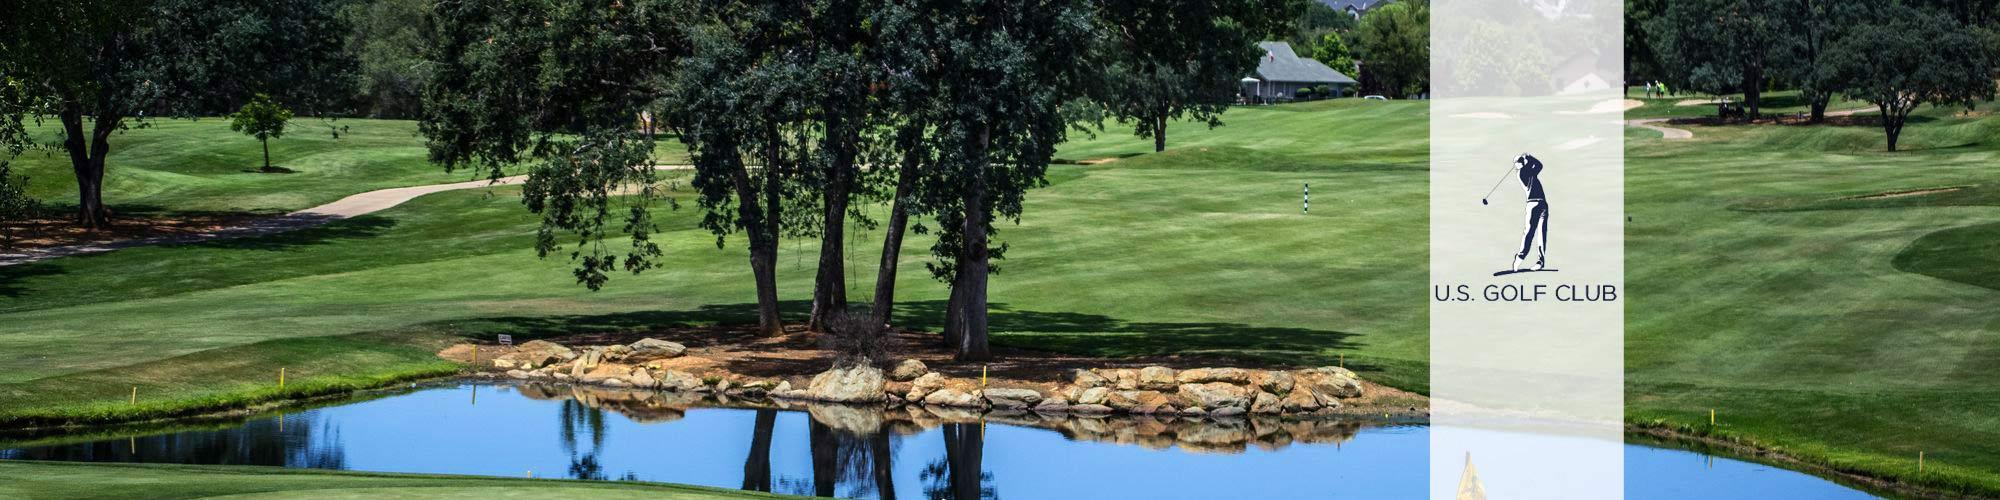 4u.s.-golf-club